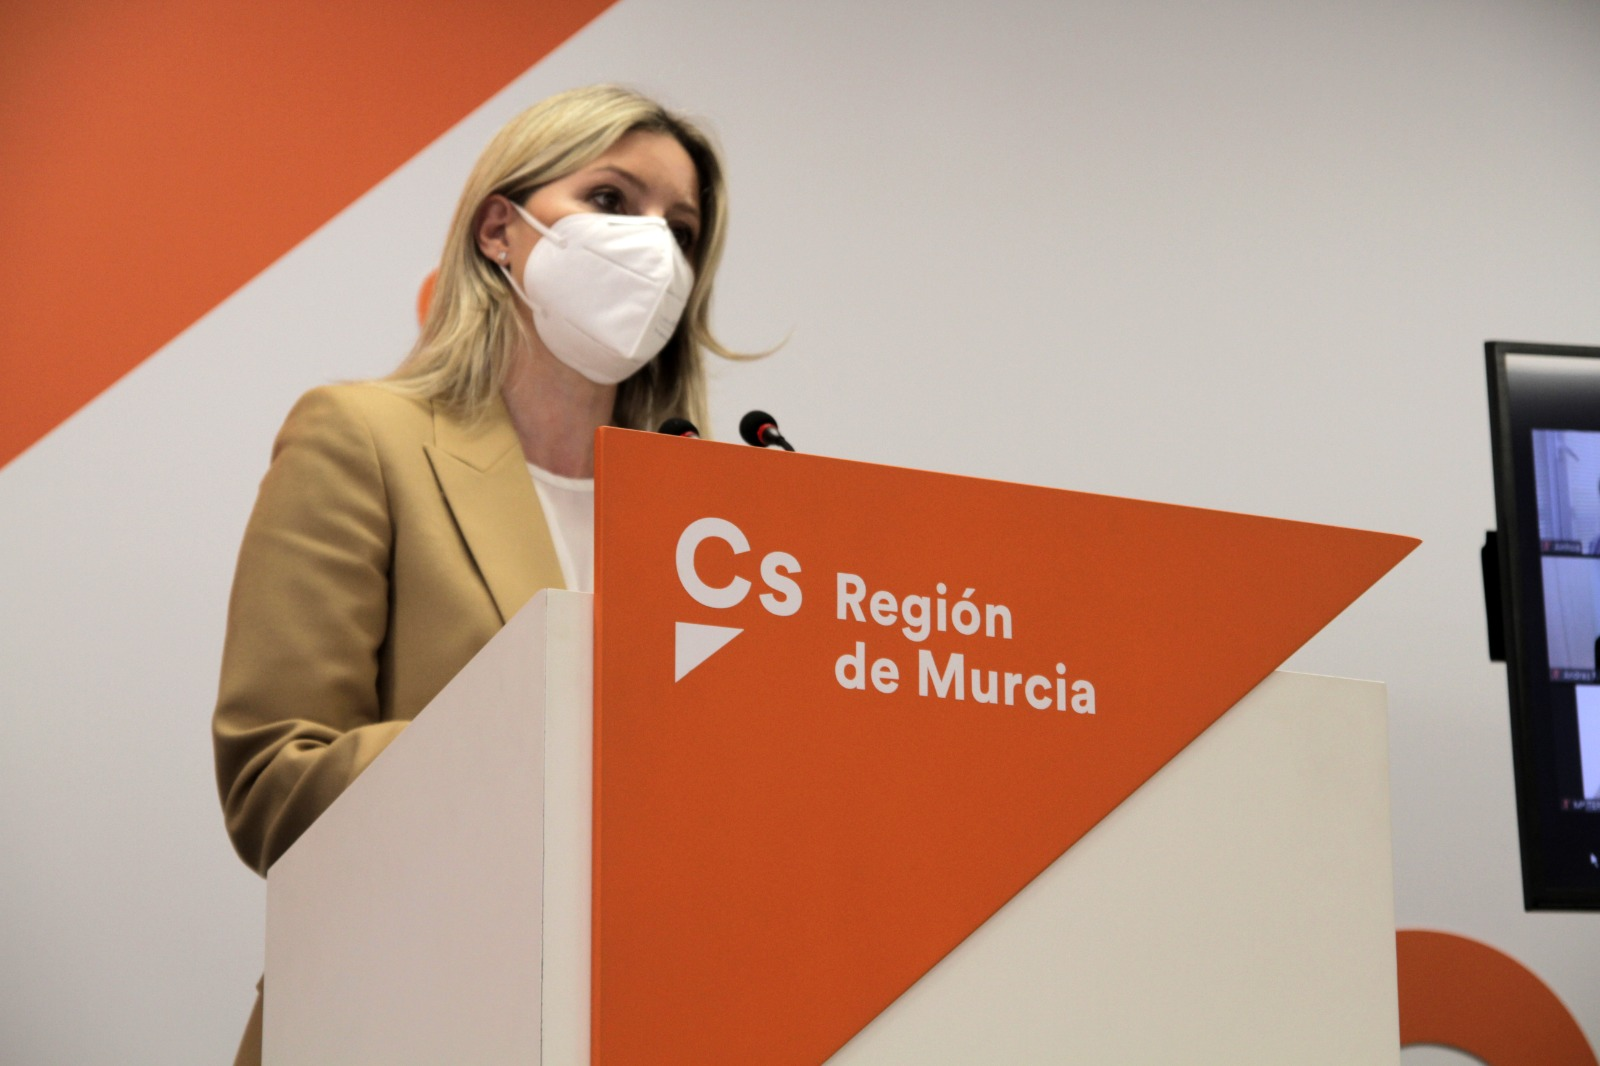 13-05 Ana Martínez Vidal Cs test de antígenos farmacias